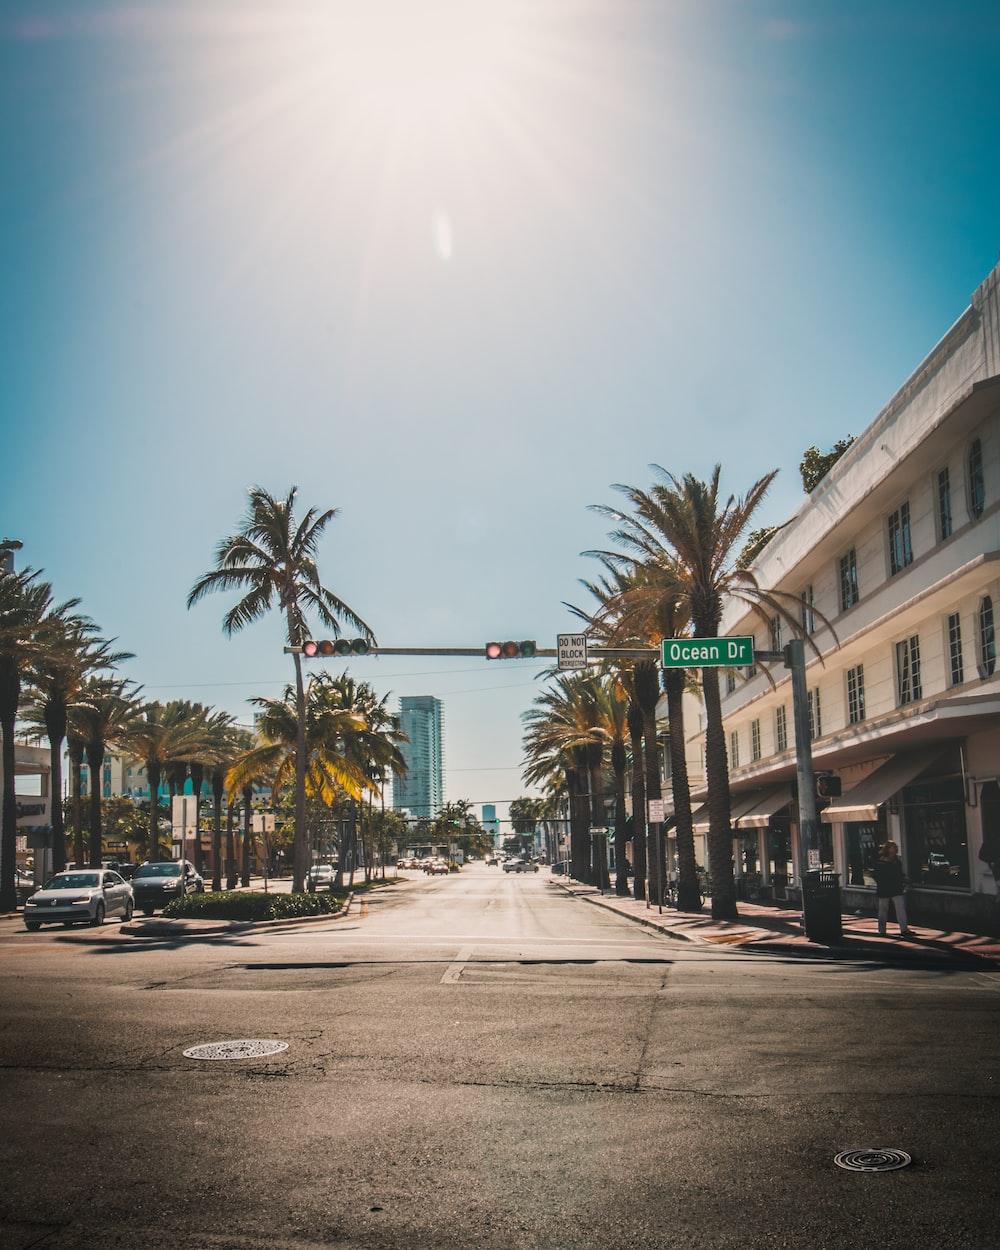 traffic light beside palm tree during daytime